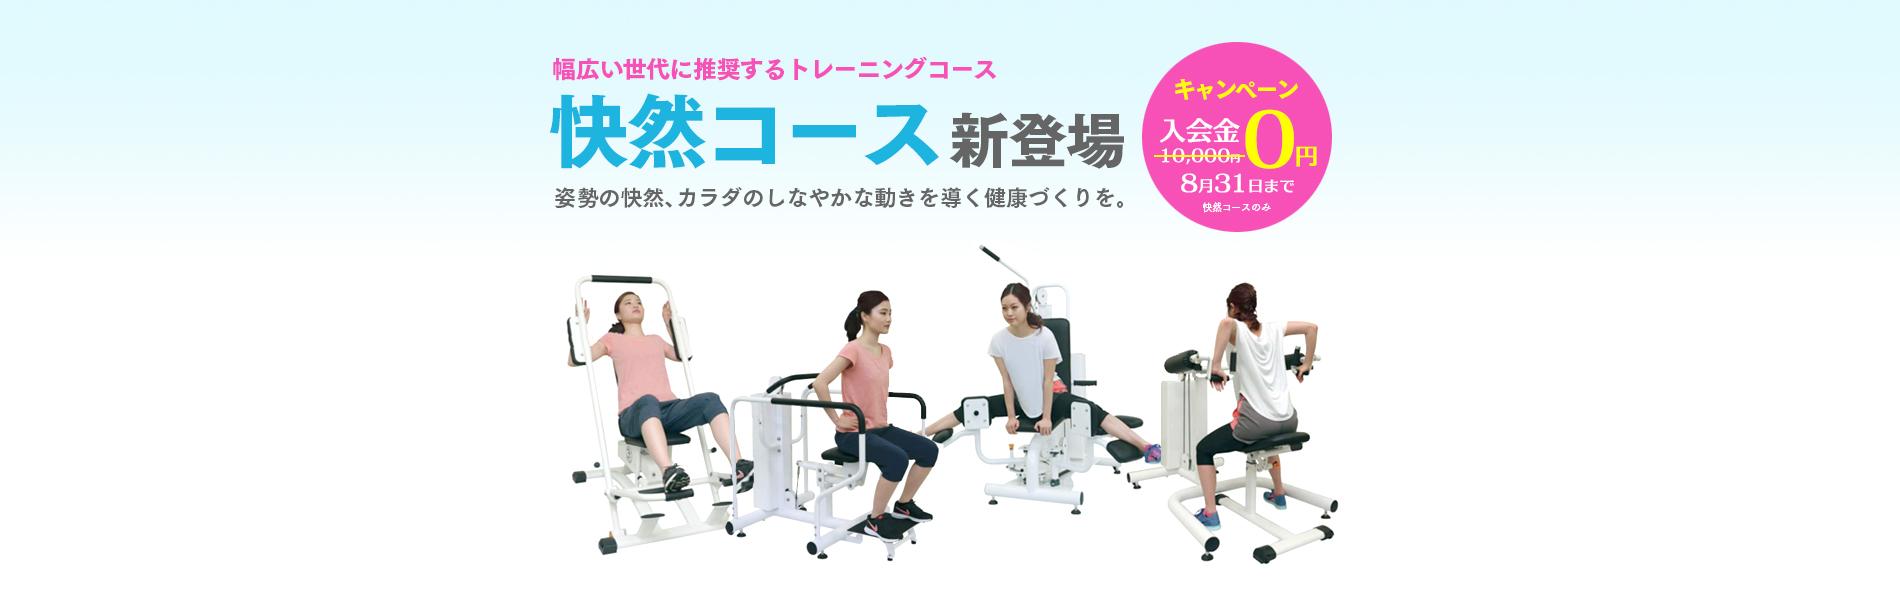 https://burn-gym.jp/kaizen/